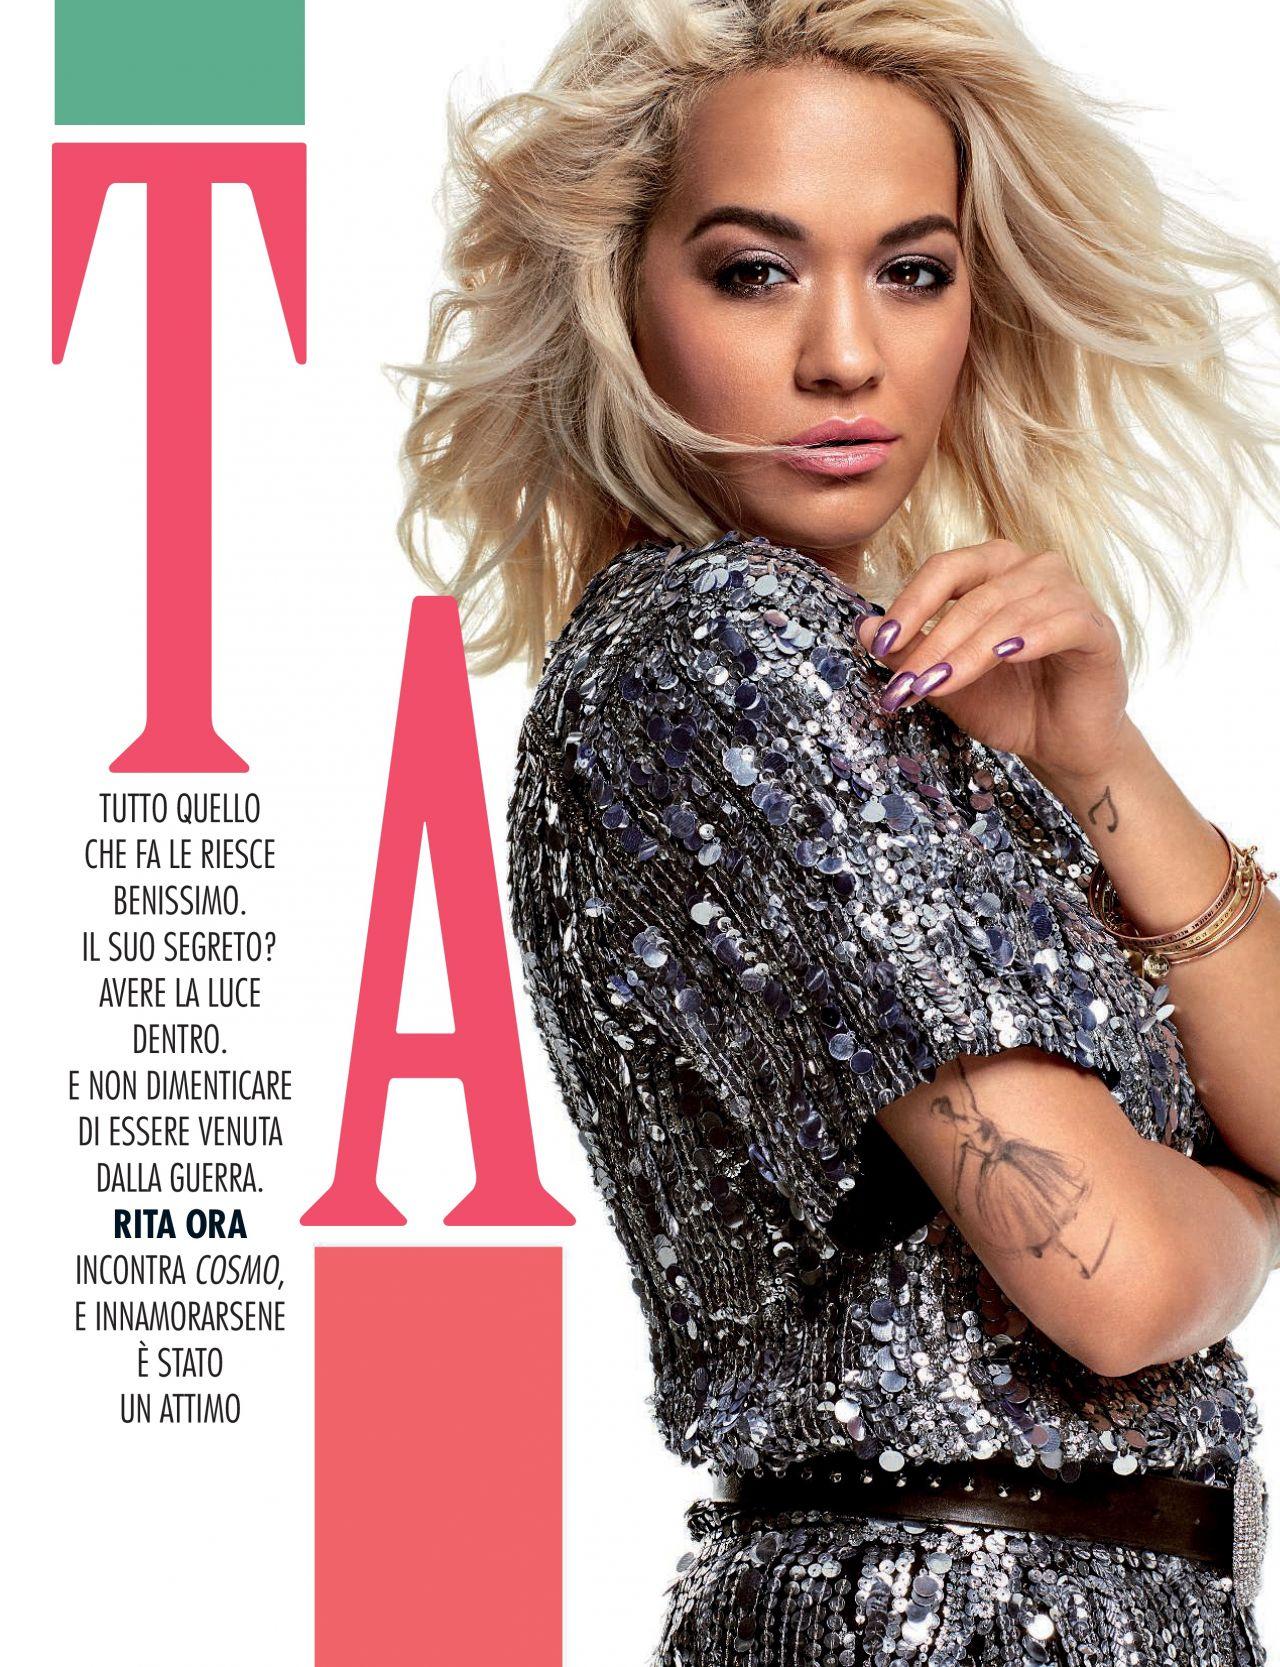 https://celebmafia.com/wp-content/uploads/2018/11/rita-ora-cosmopolitan-italy-december-2018-issue-3.jpg